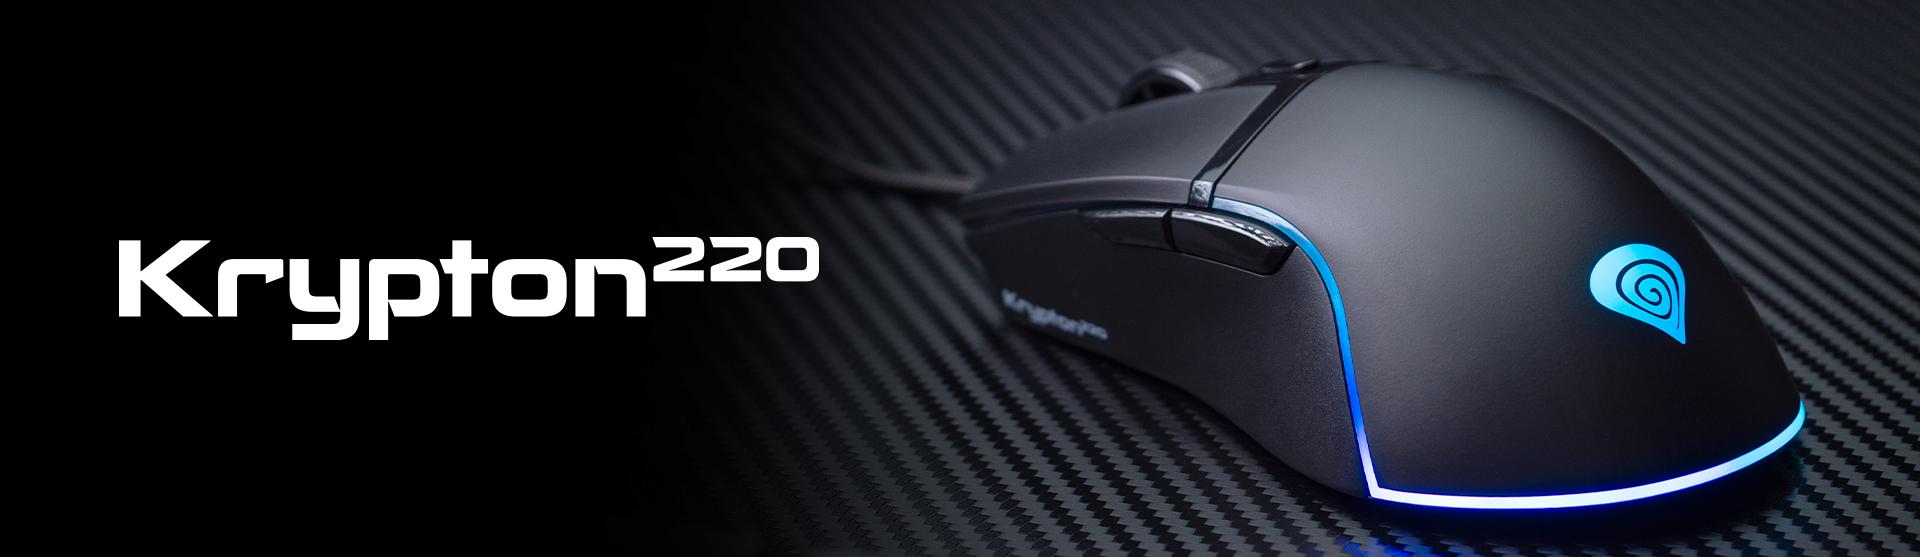 gaming mouse genesis krypton 220 6400 dpi rgb black software 8